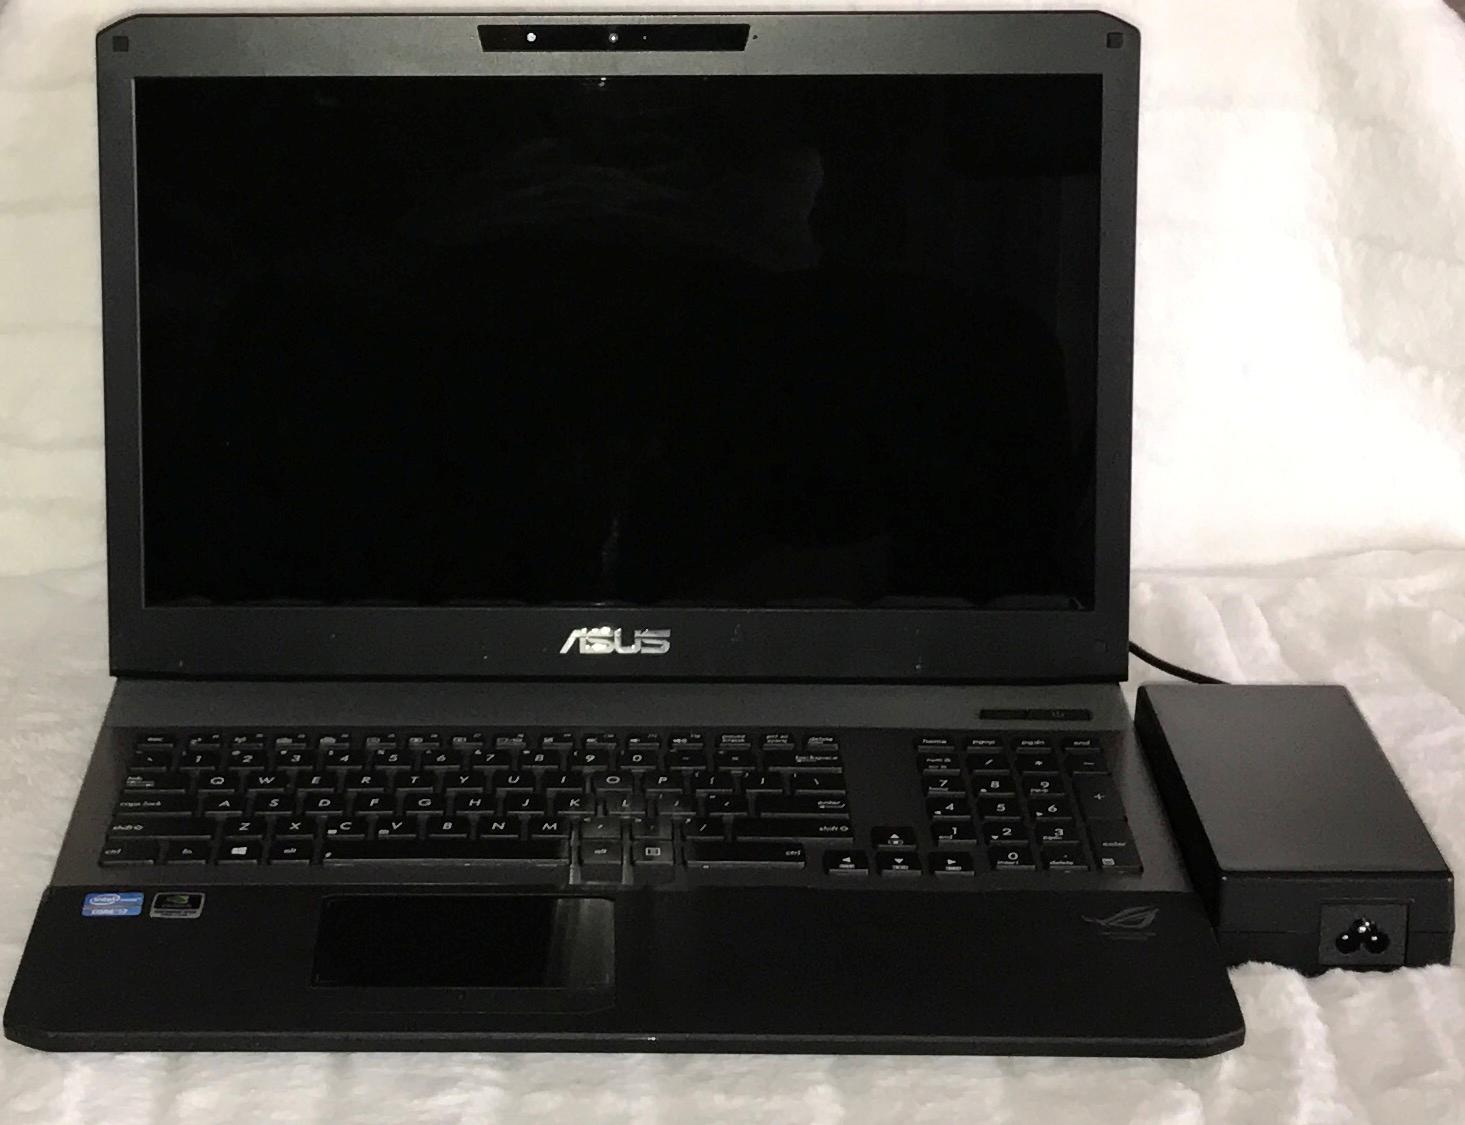 $430.00 - ASUS ROG G75V Gaming 1TB 16GB RAM Core i7 3630QM 2.4GHz Win7 Pro 1920x1080 #16